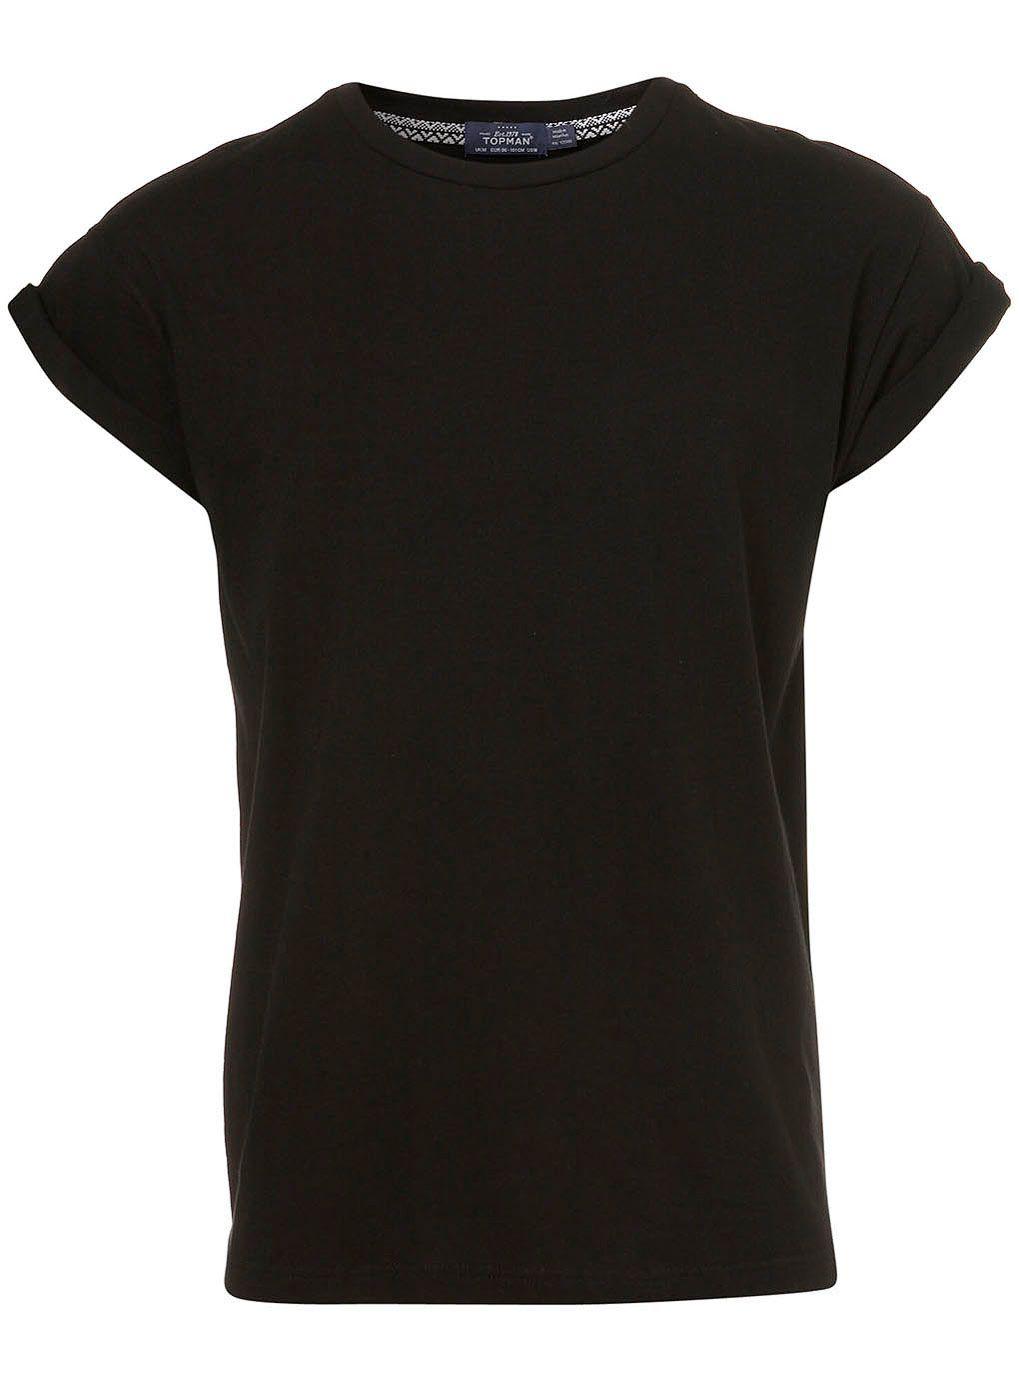 Black t shirt topman - Men S T Shirts